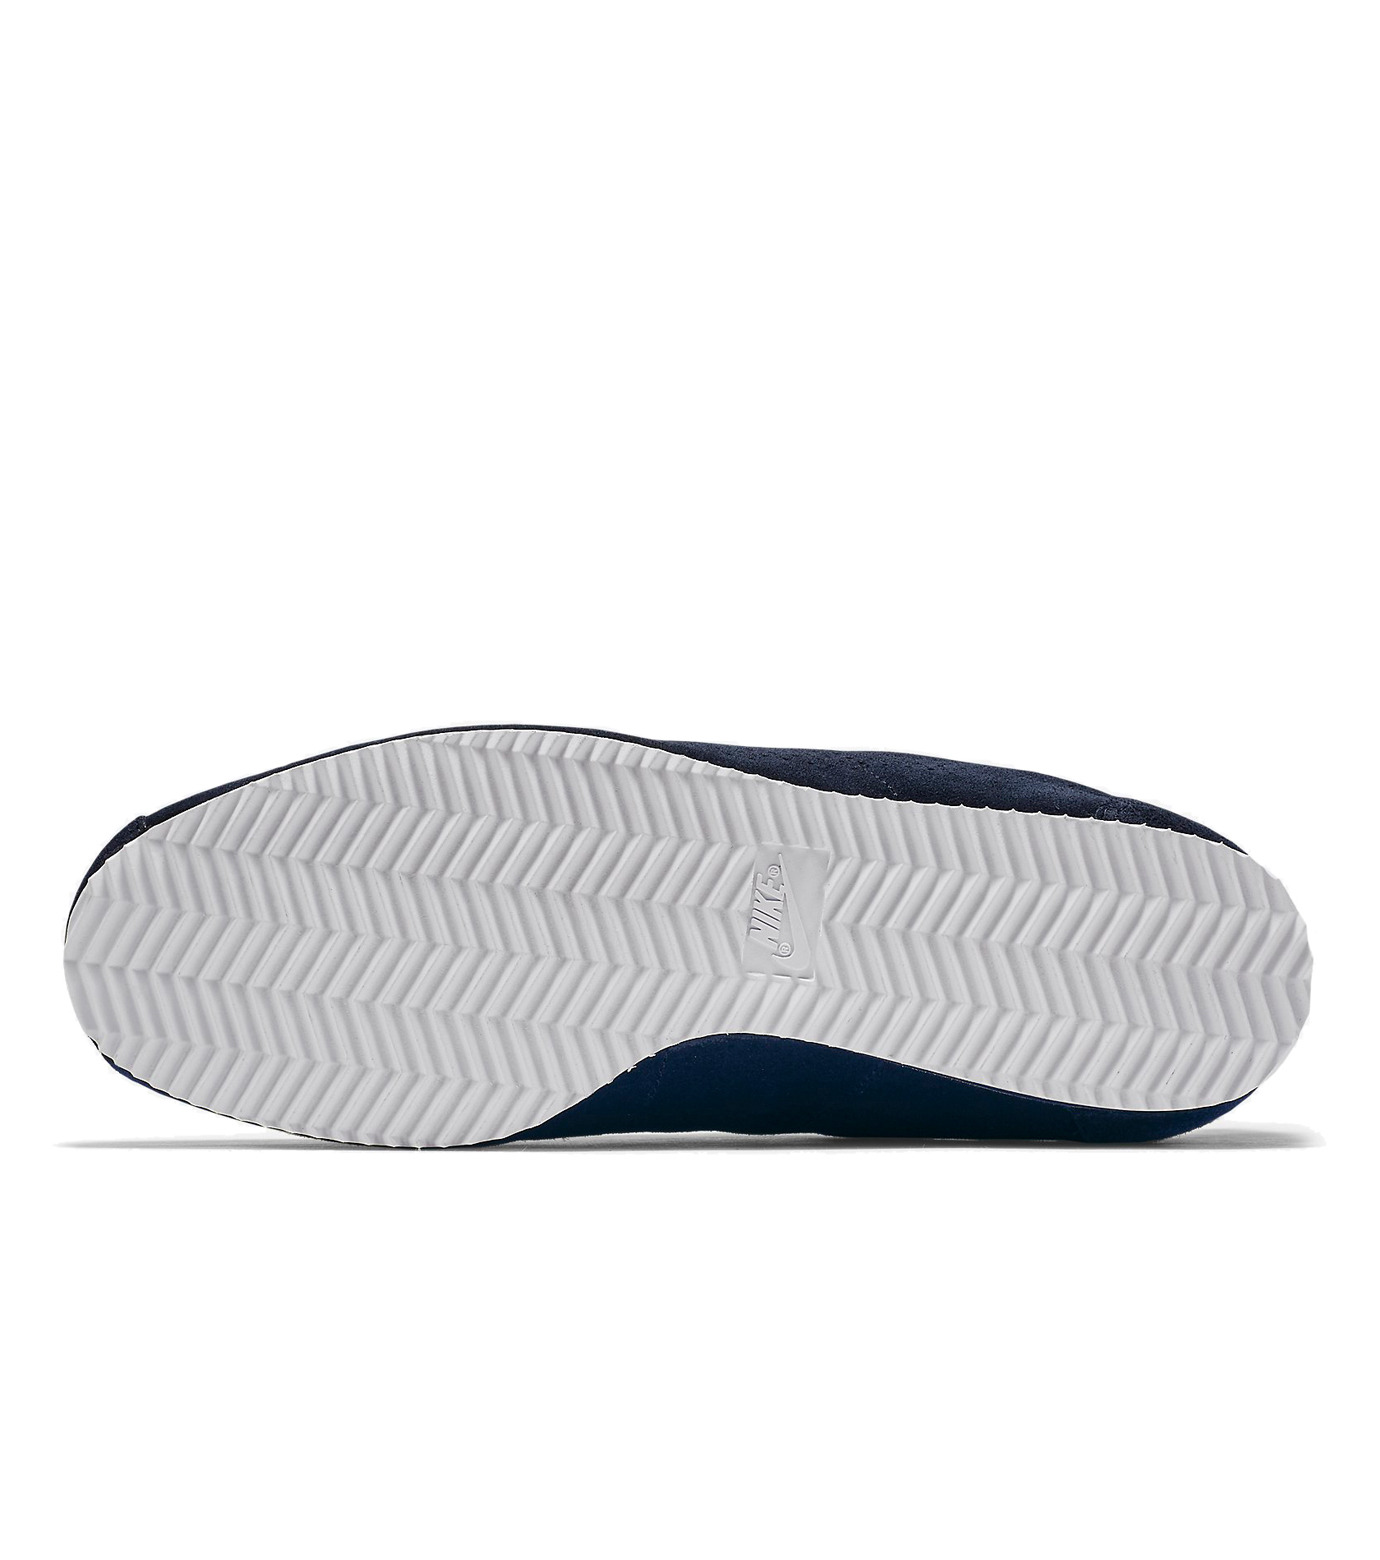 NIKE(ナイキ)のCLASSIC CORTEZ LX-BLUE(シューズ/shoes)-823914-400-92 拡大詳細画像2